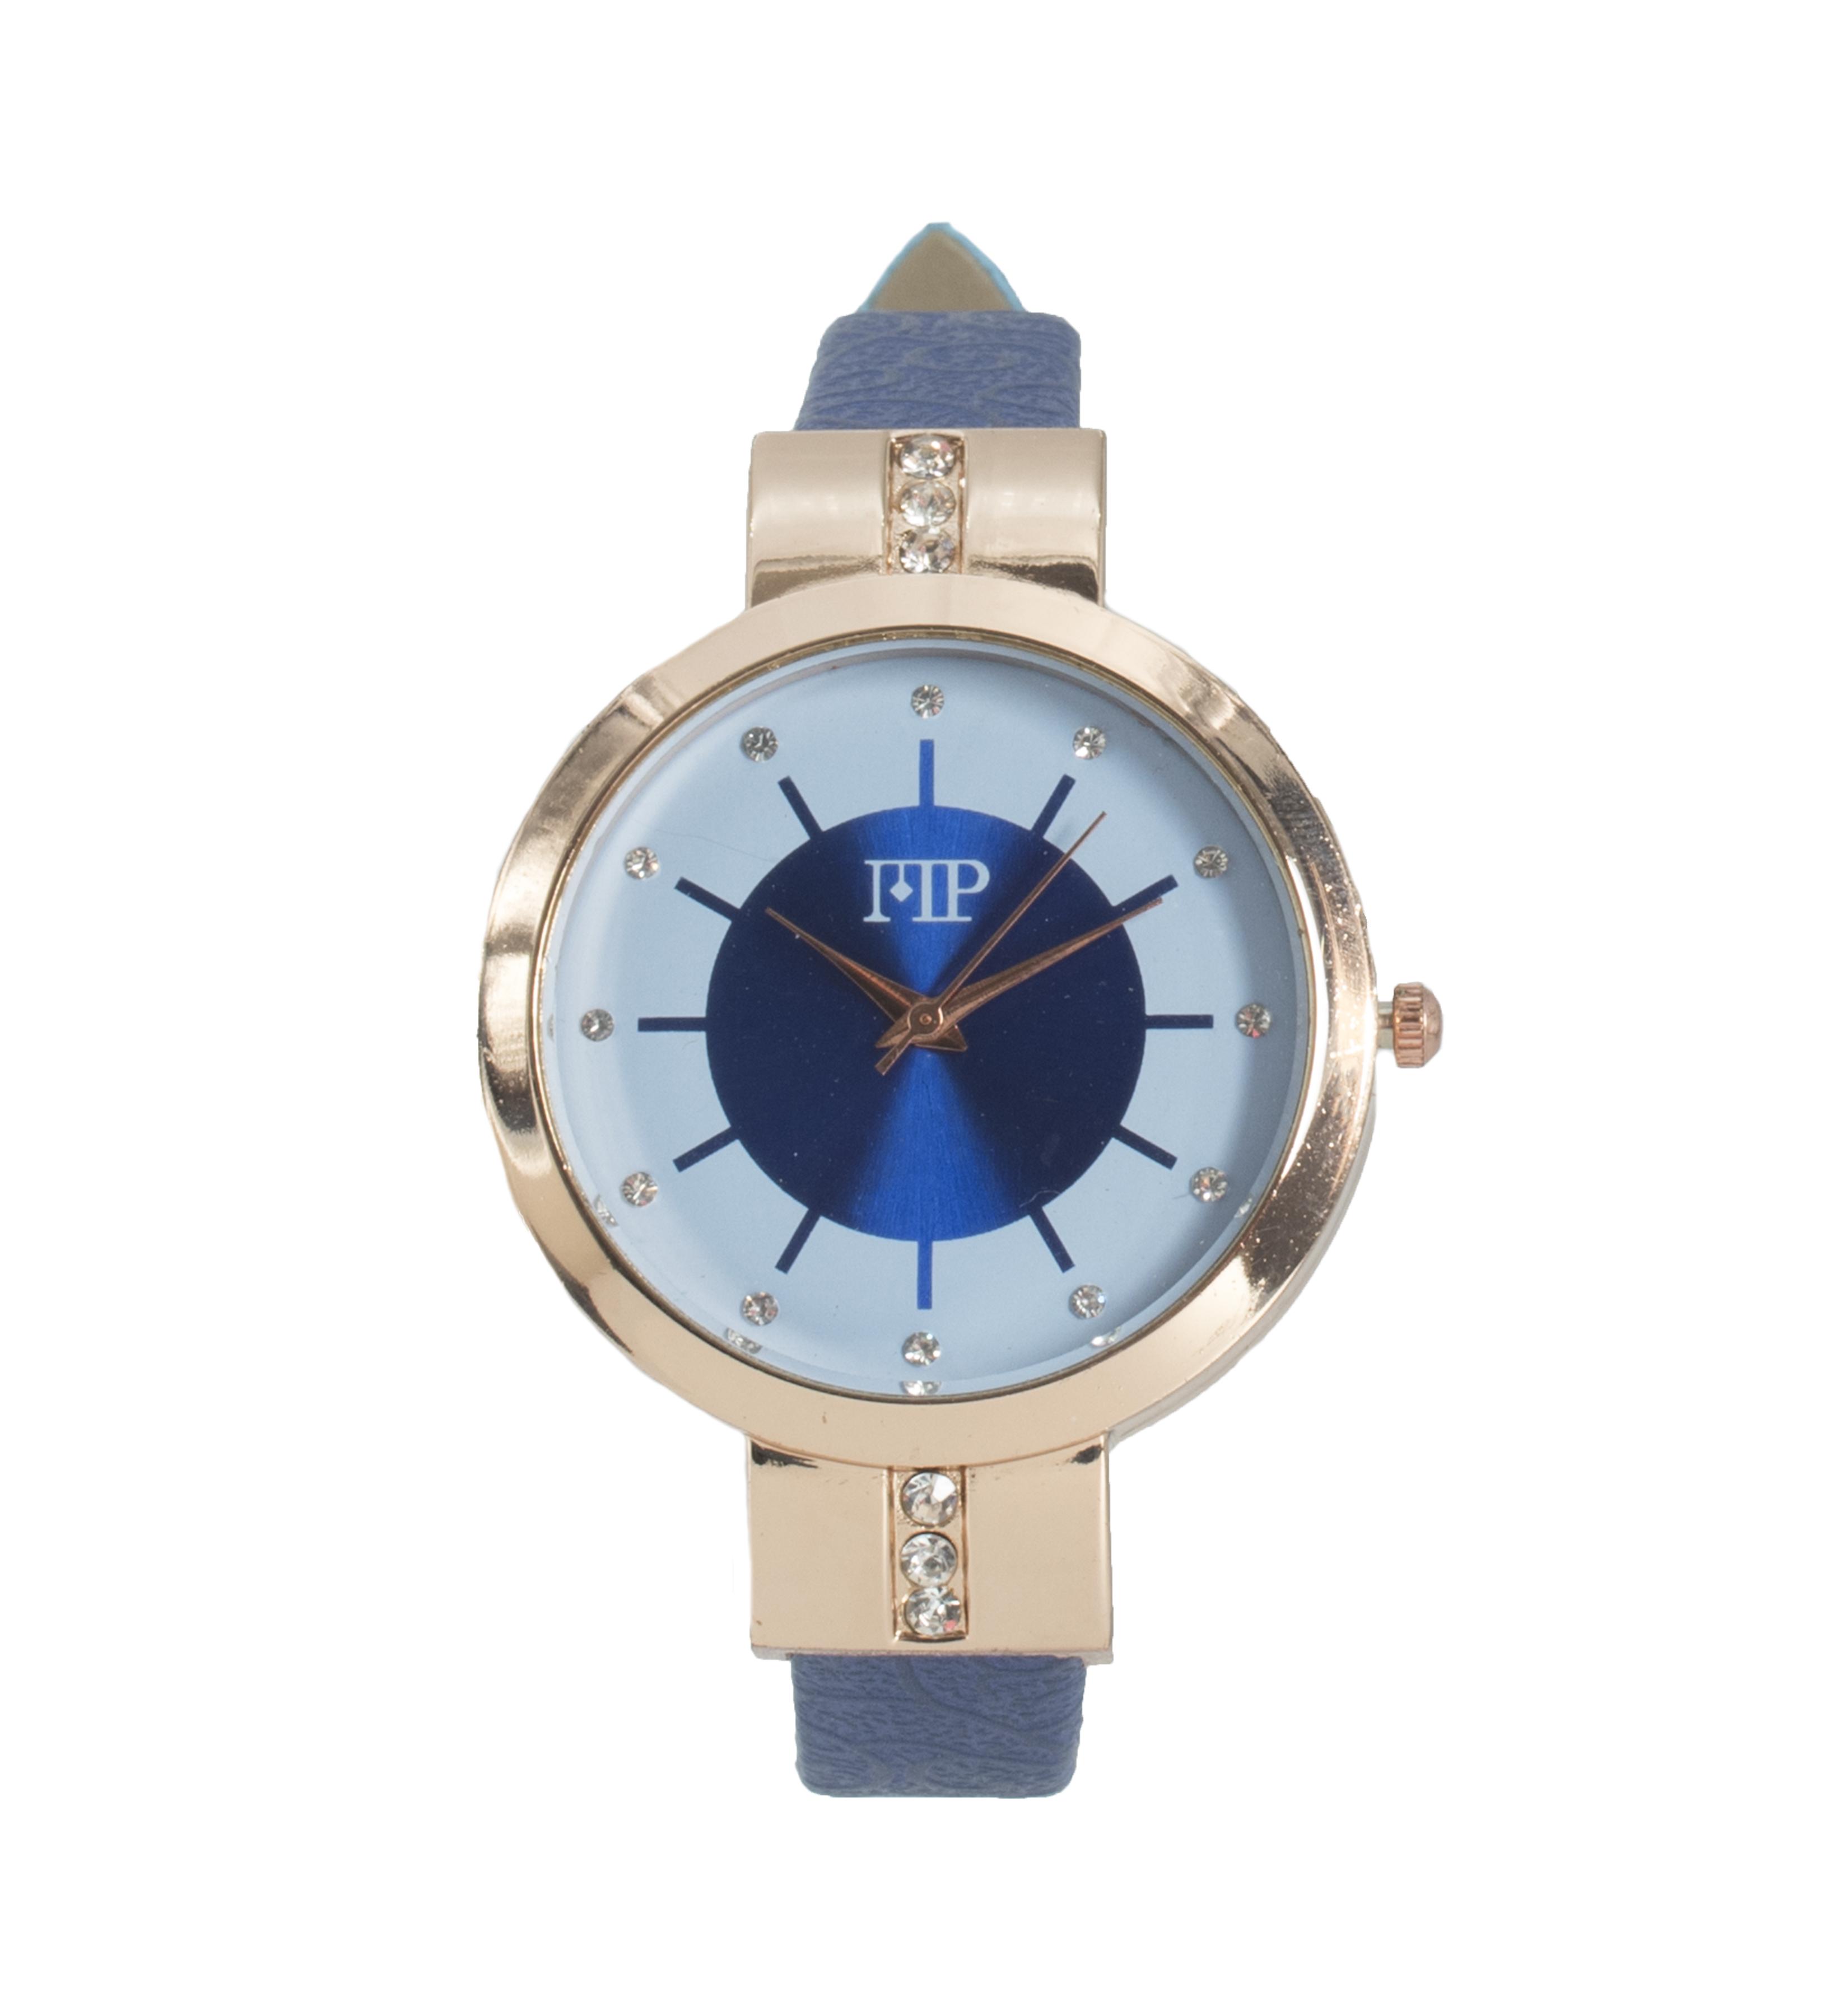 Comprar Marsan Piel Horloge analogique Breid bleu